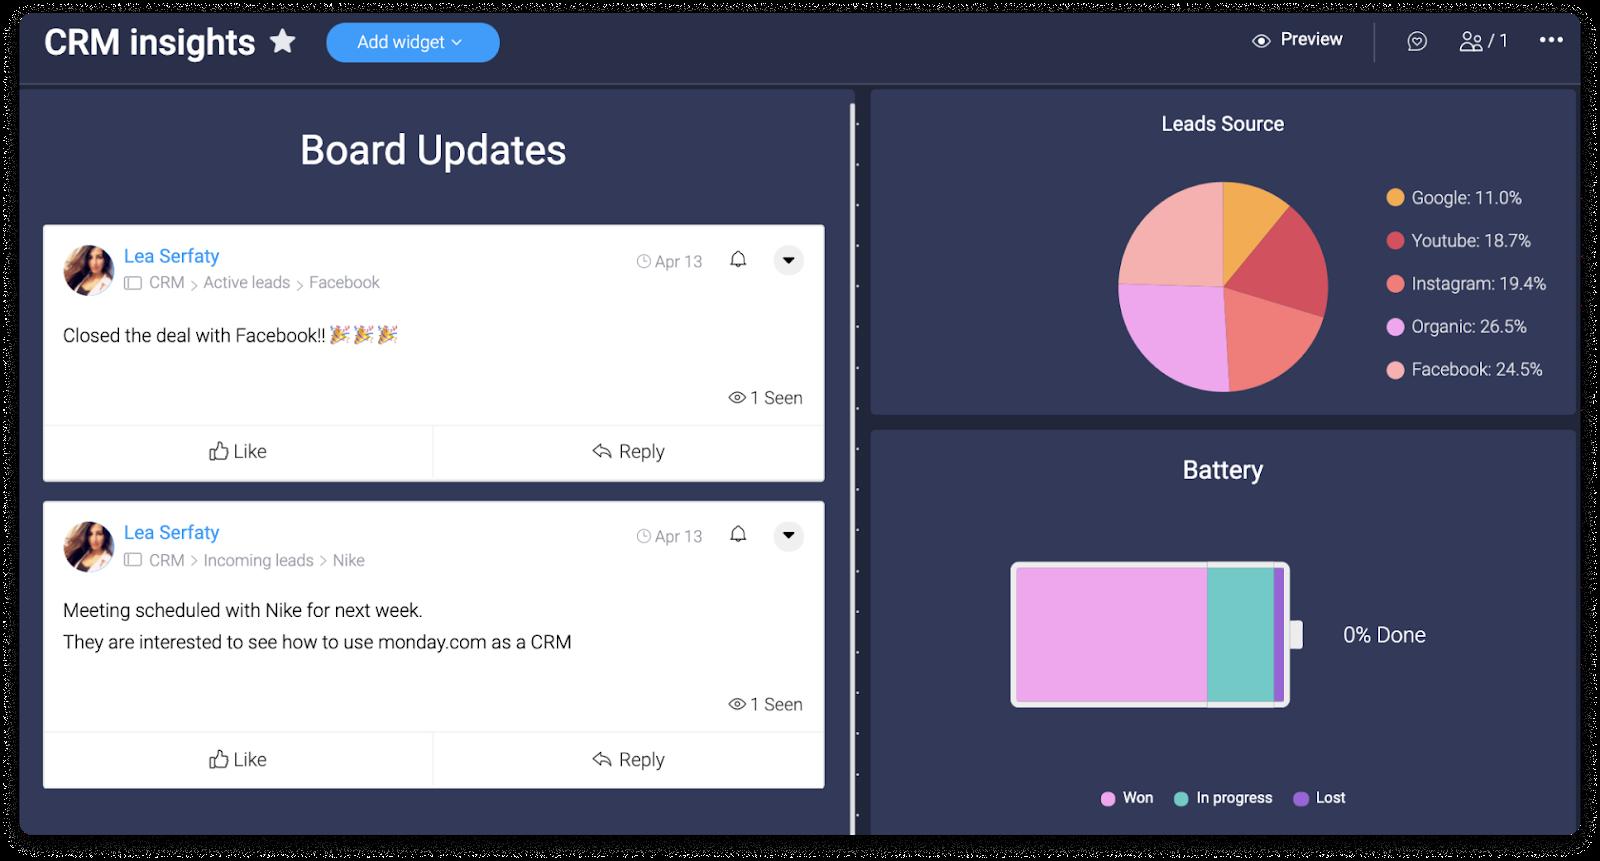 Screenshot displaying a typical marketing team's KPI dashboard.